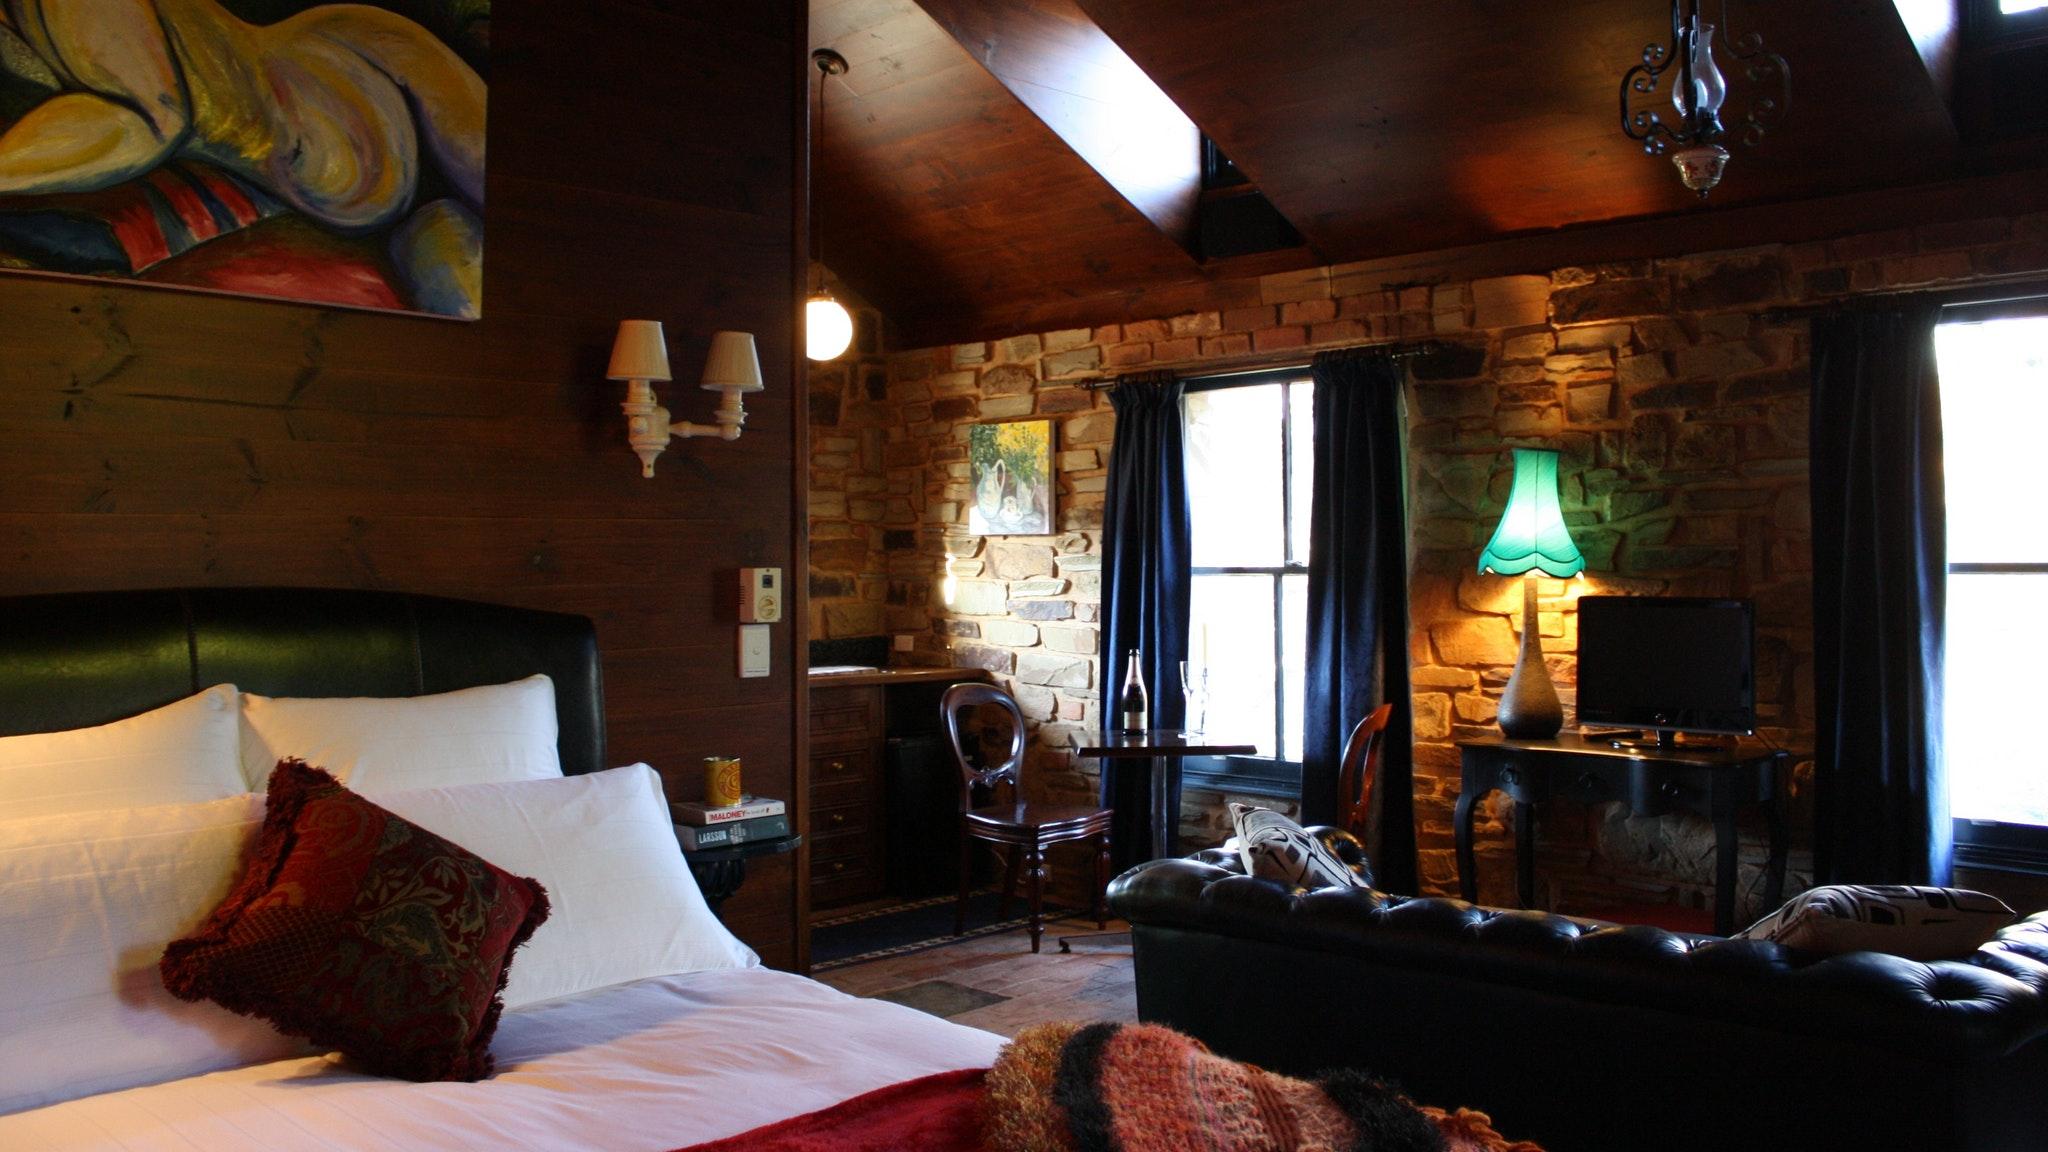 Ottery Cottage studio style accommodation